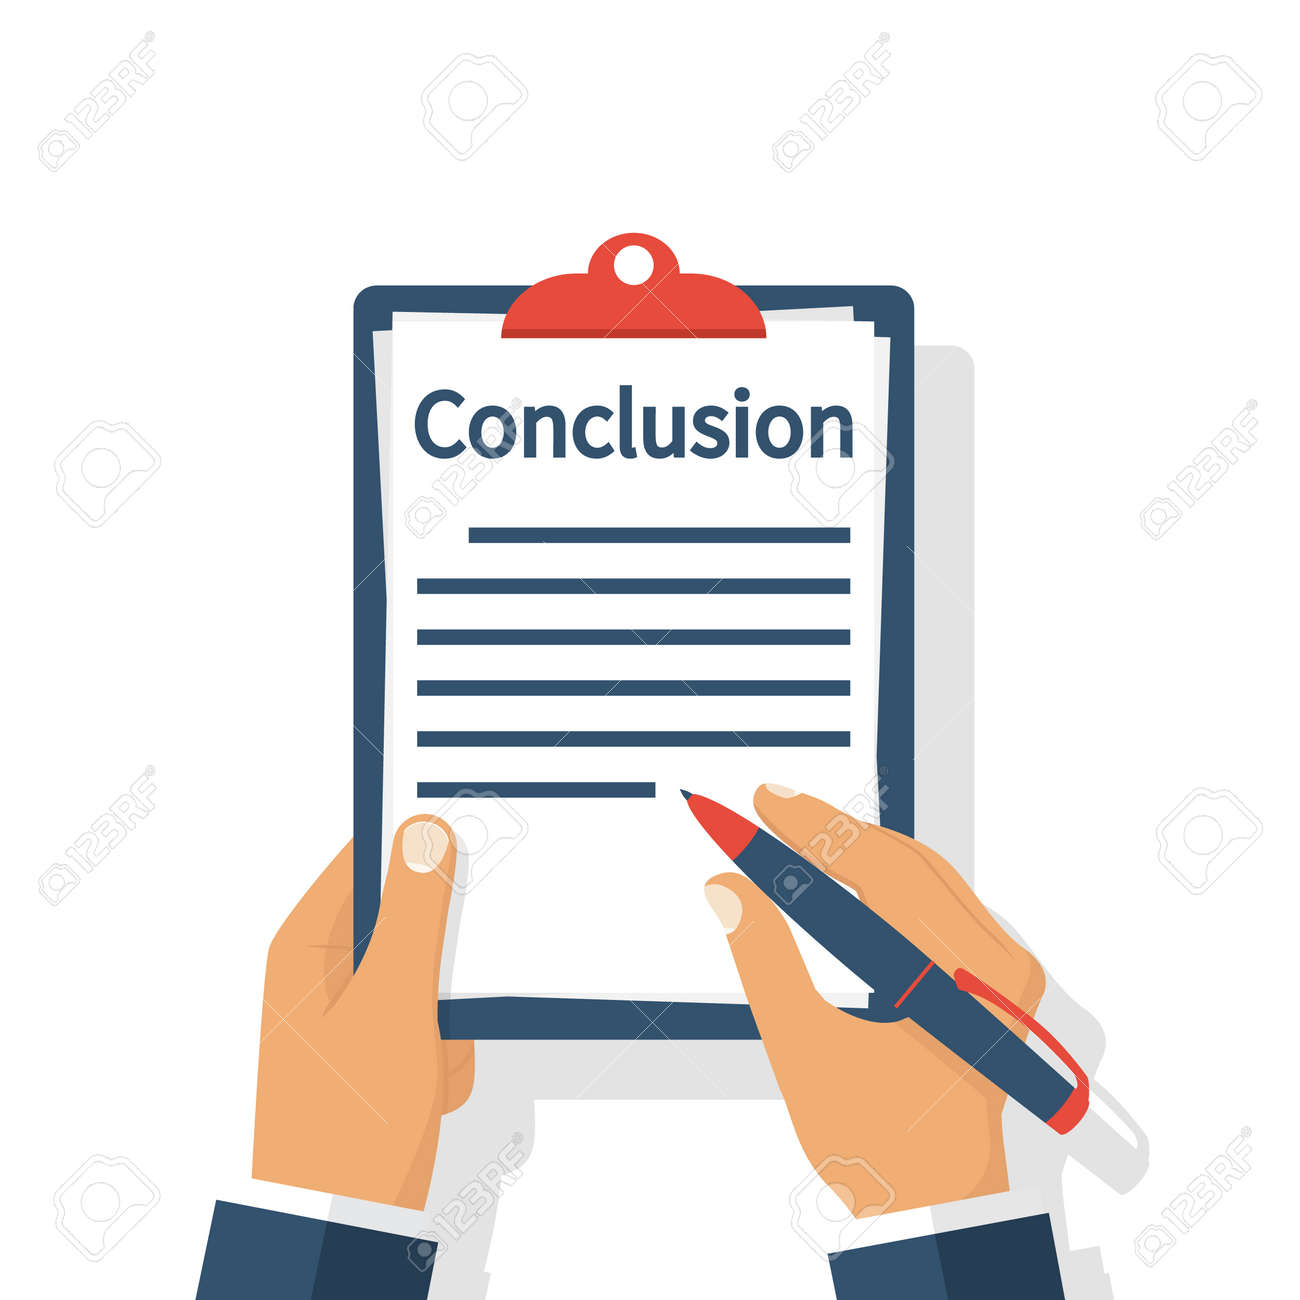 businessman writes conclusion report concept paperwork sheets rh 123rf com drawing conclusion clipart conclusion clipart images